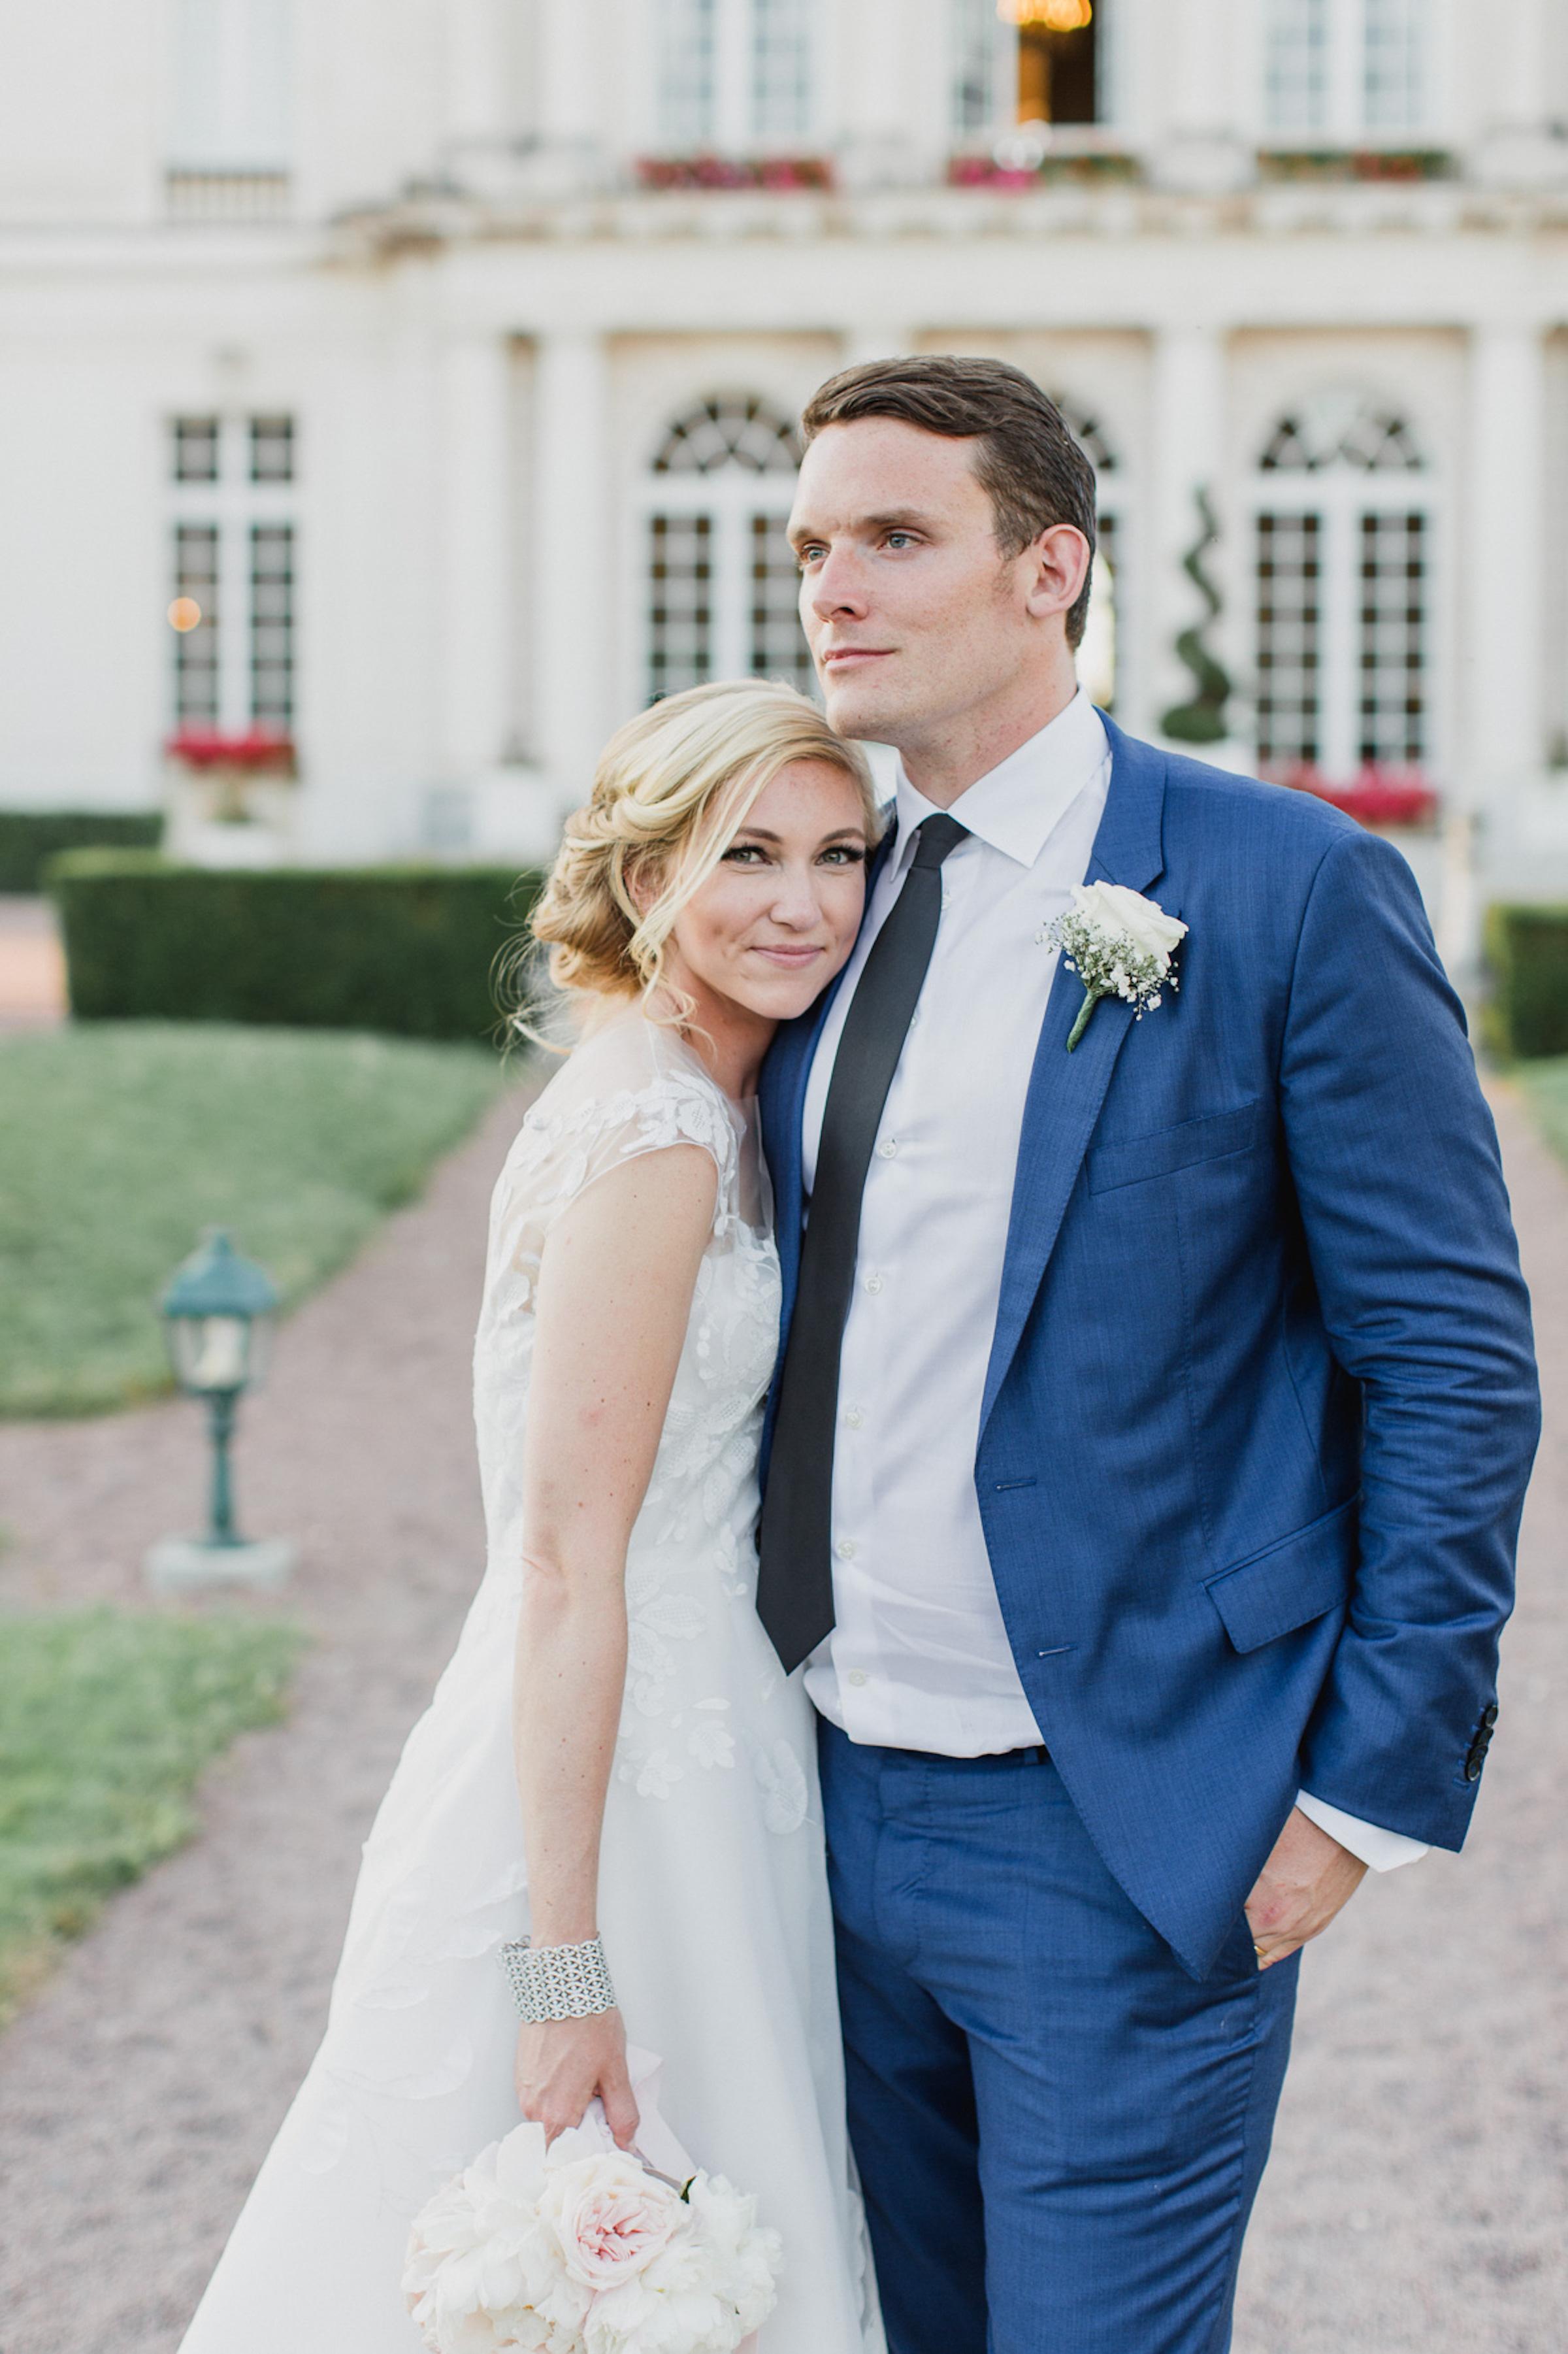 Lauren-and-Maxime-Lifestories-wedding-photography-france-0500-MK3_9738.jpg